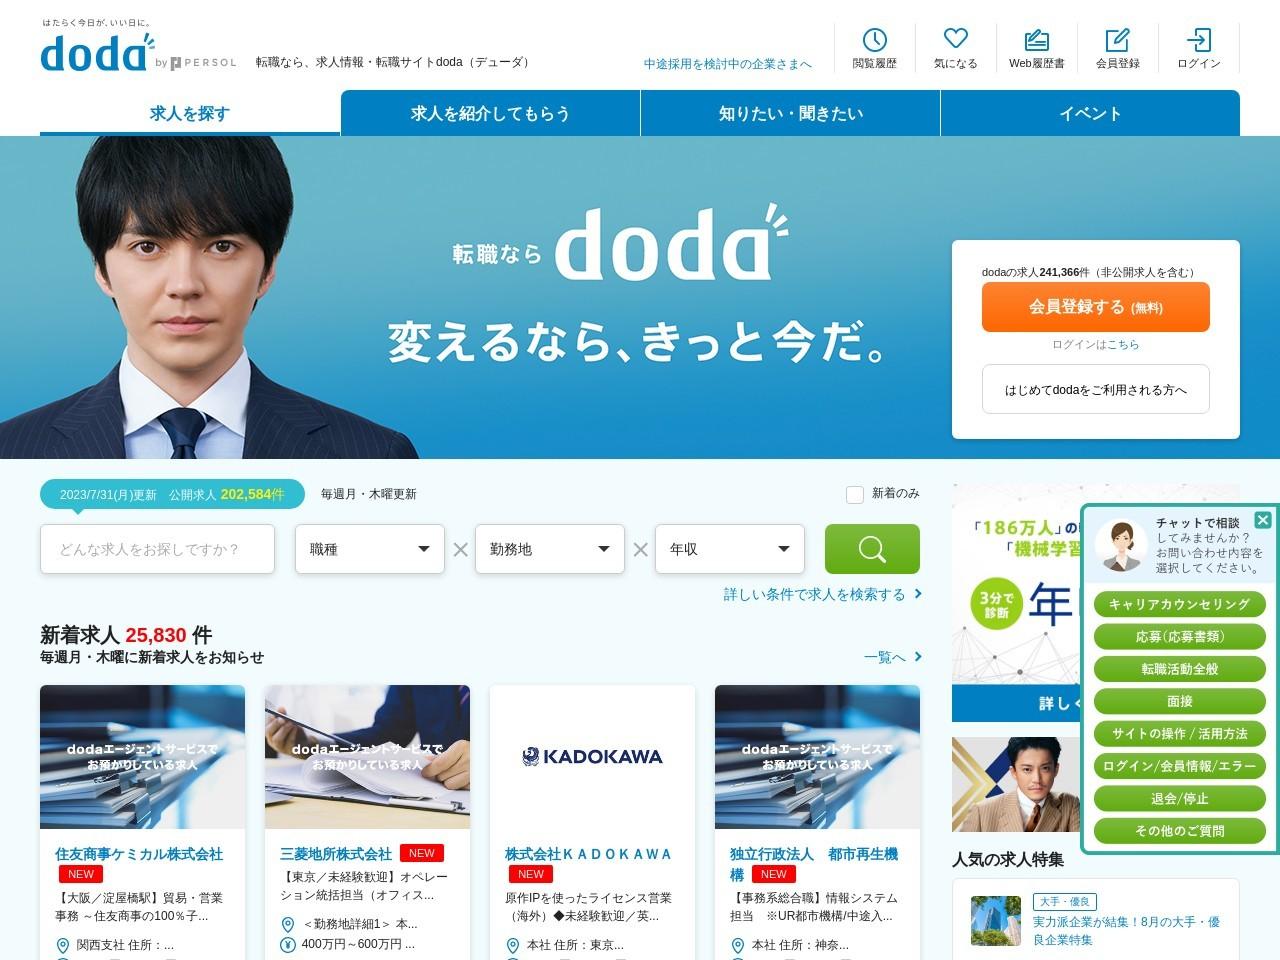 https://doda.jp/promo/fair/tokyo/0201.html?cid=001002020057005&trflg=1